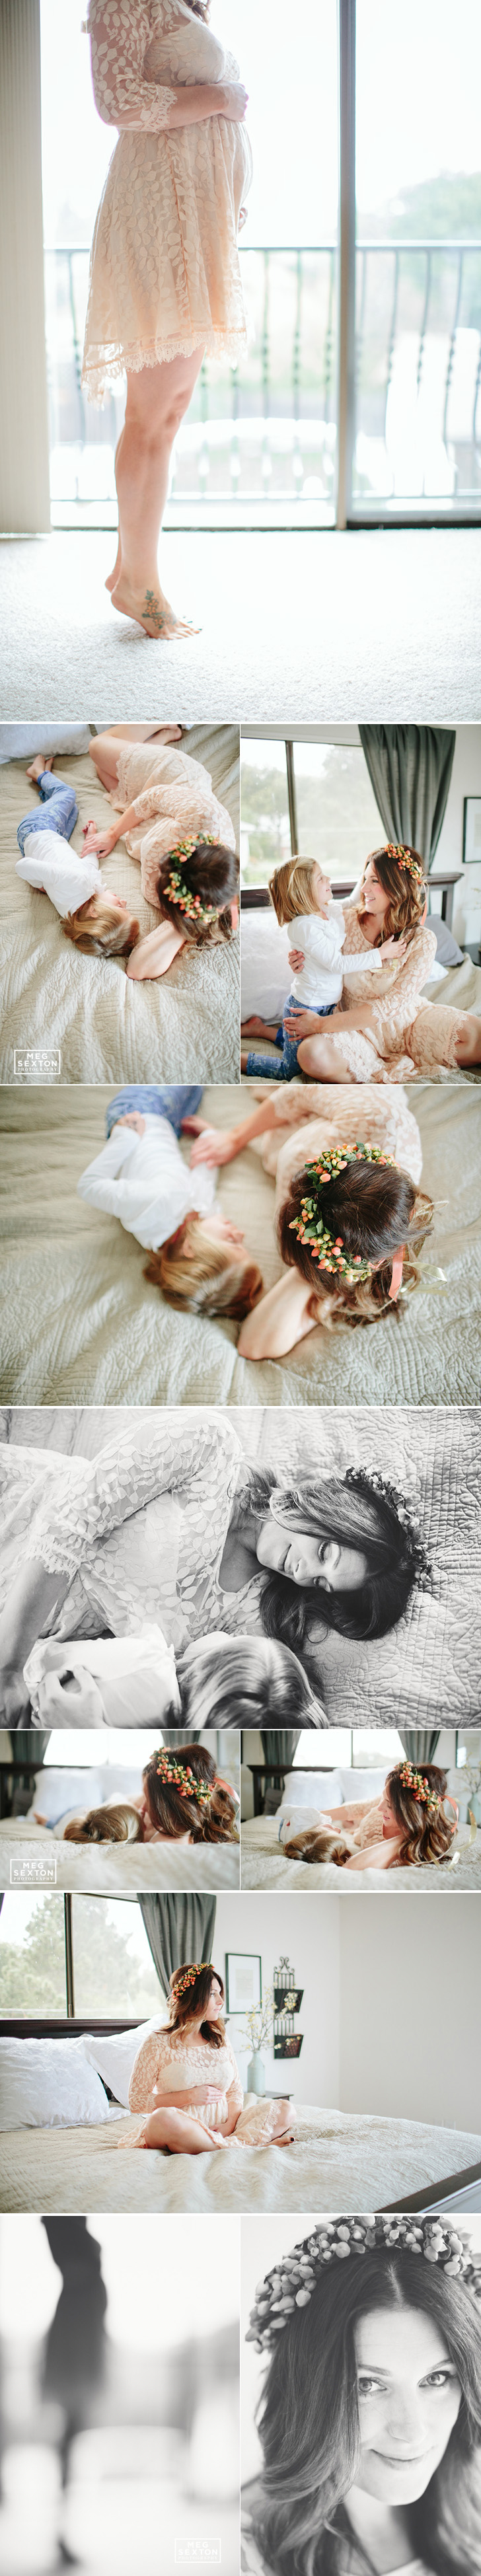 lifestyle maternity photos